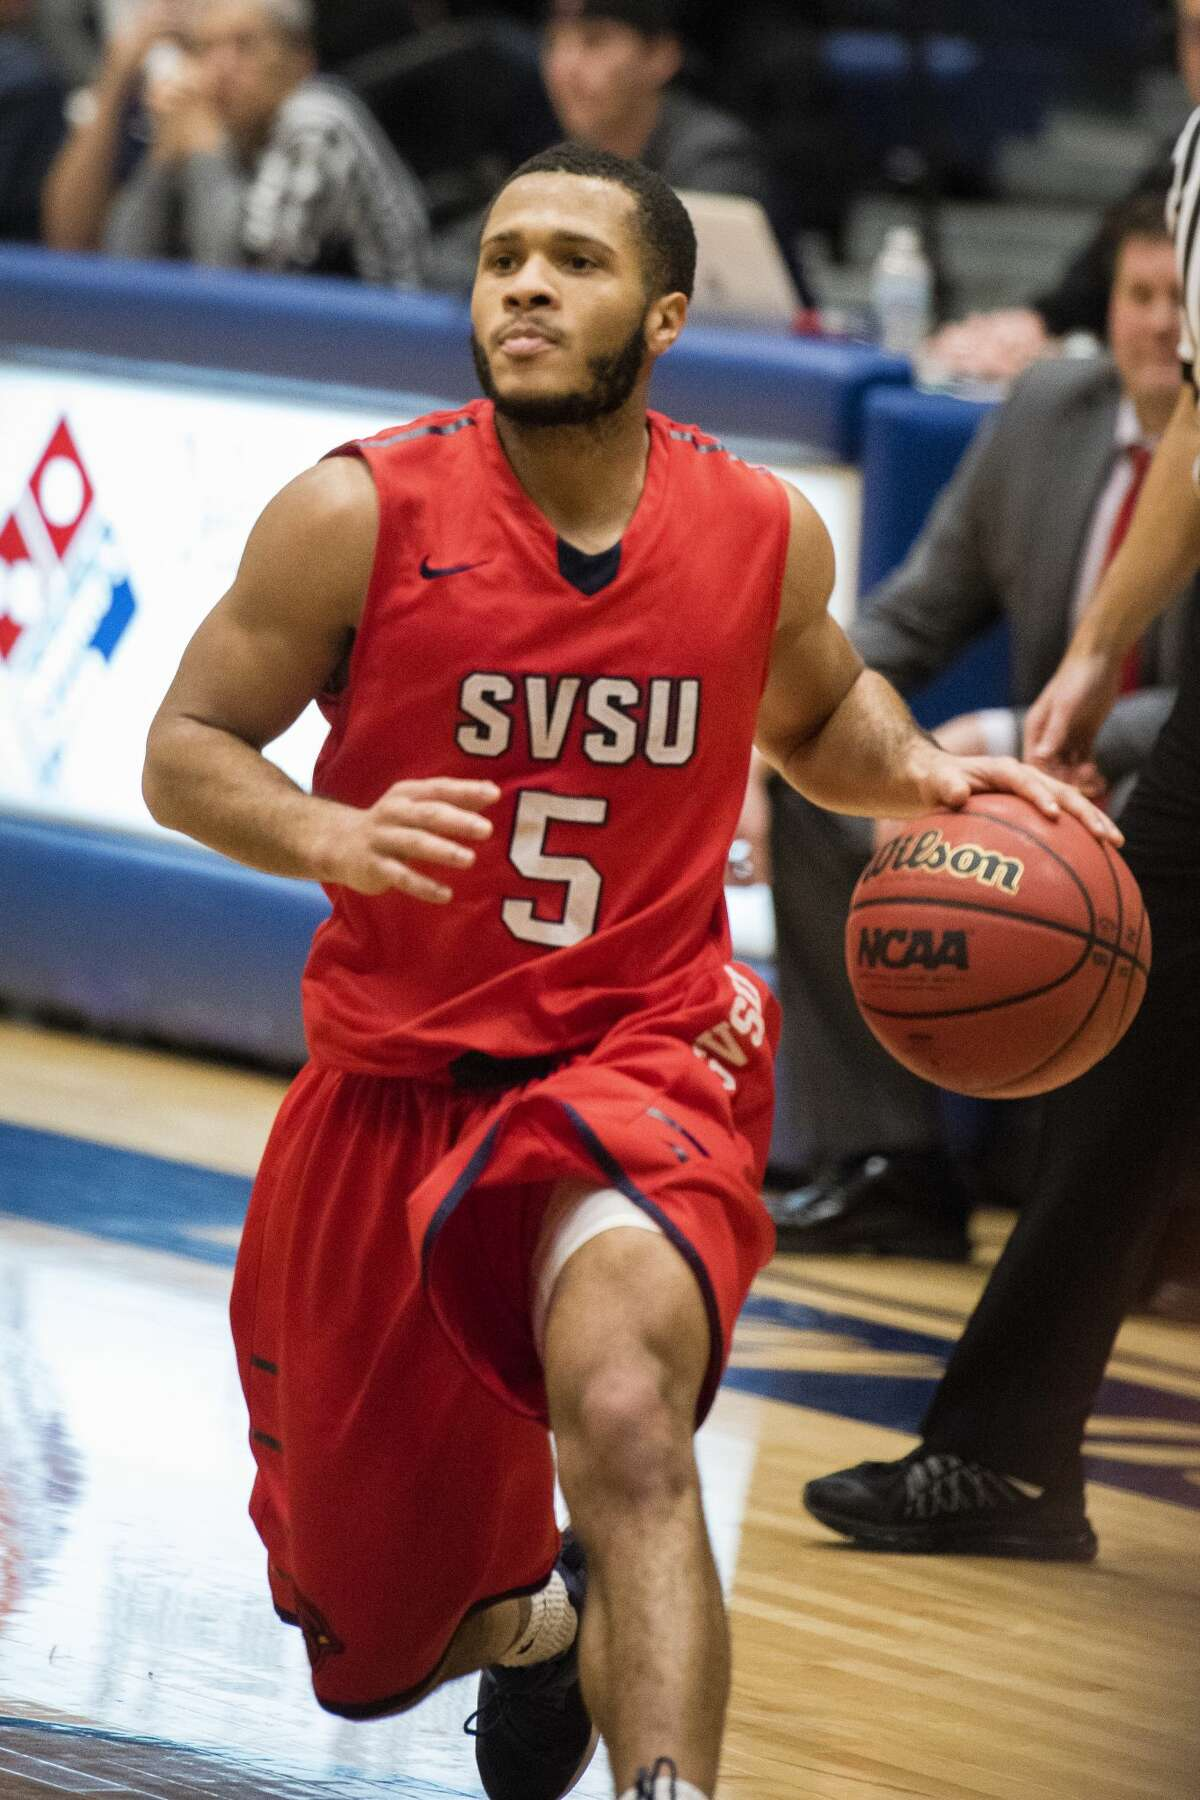 SVSU's Mike Wells Jr. dribbles the ball as Northwood University hosted Saginaw Valley State University on Saturday, Dec. 16, 2017. SVSU beat Northwood 64-53. (Danielle McGrew Tenbusch/for the Daily News)